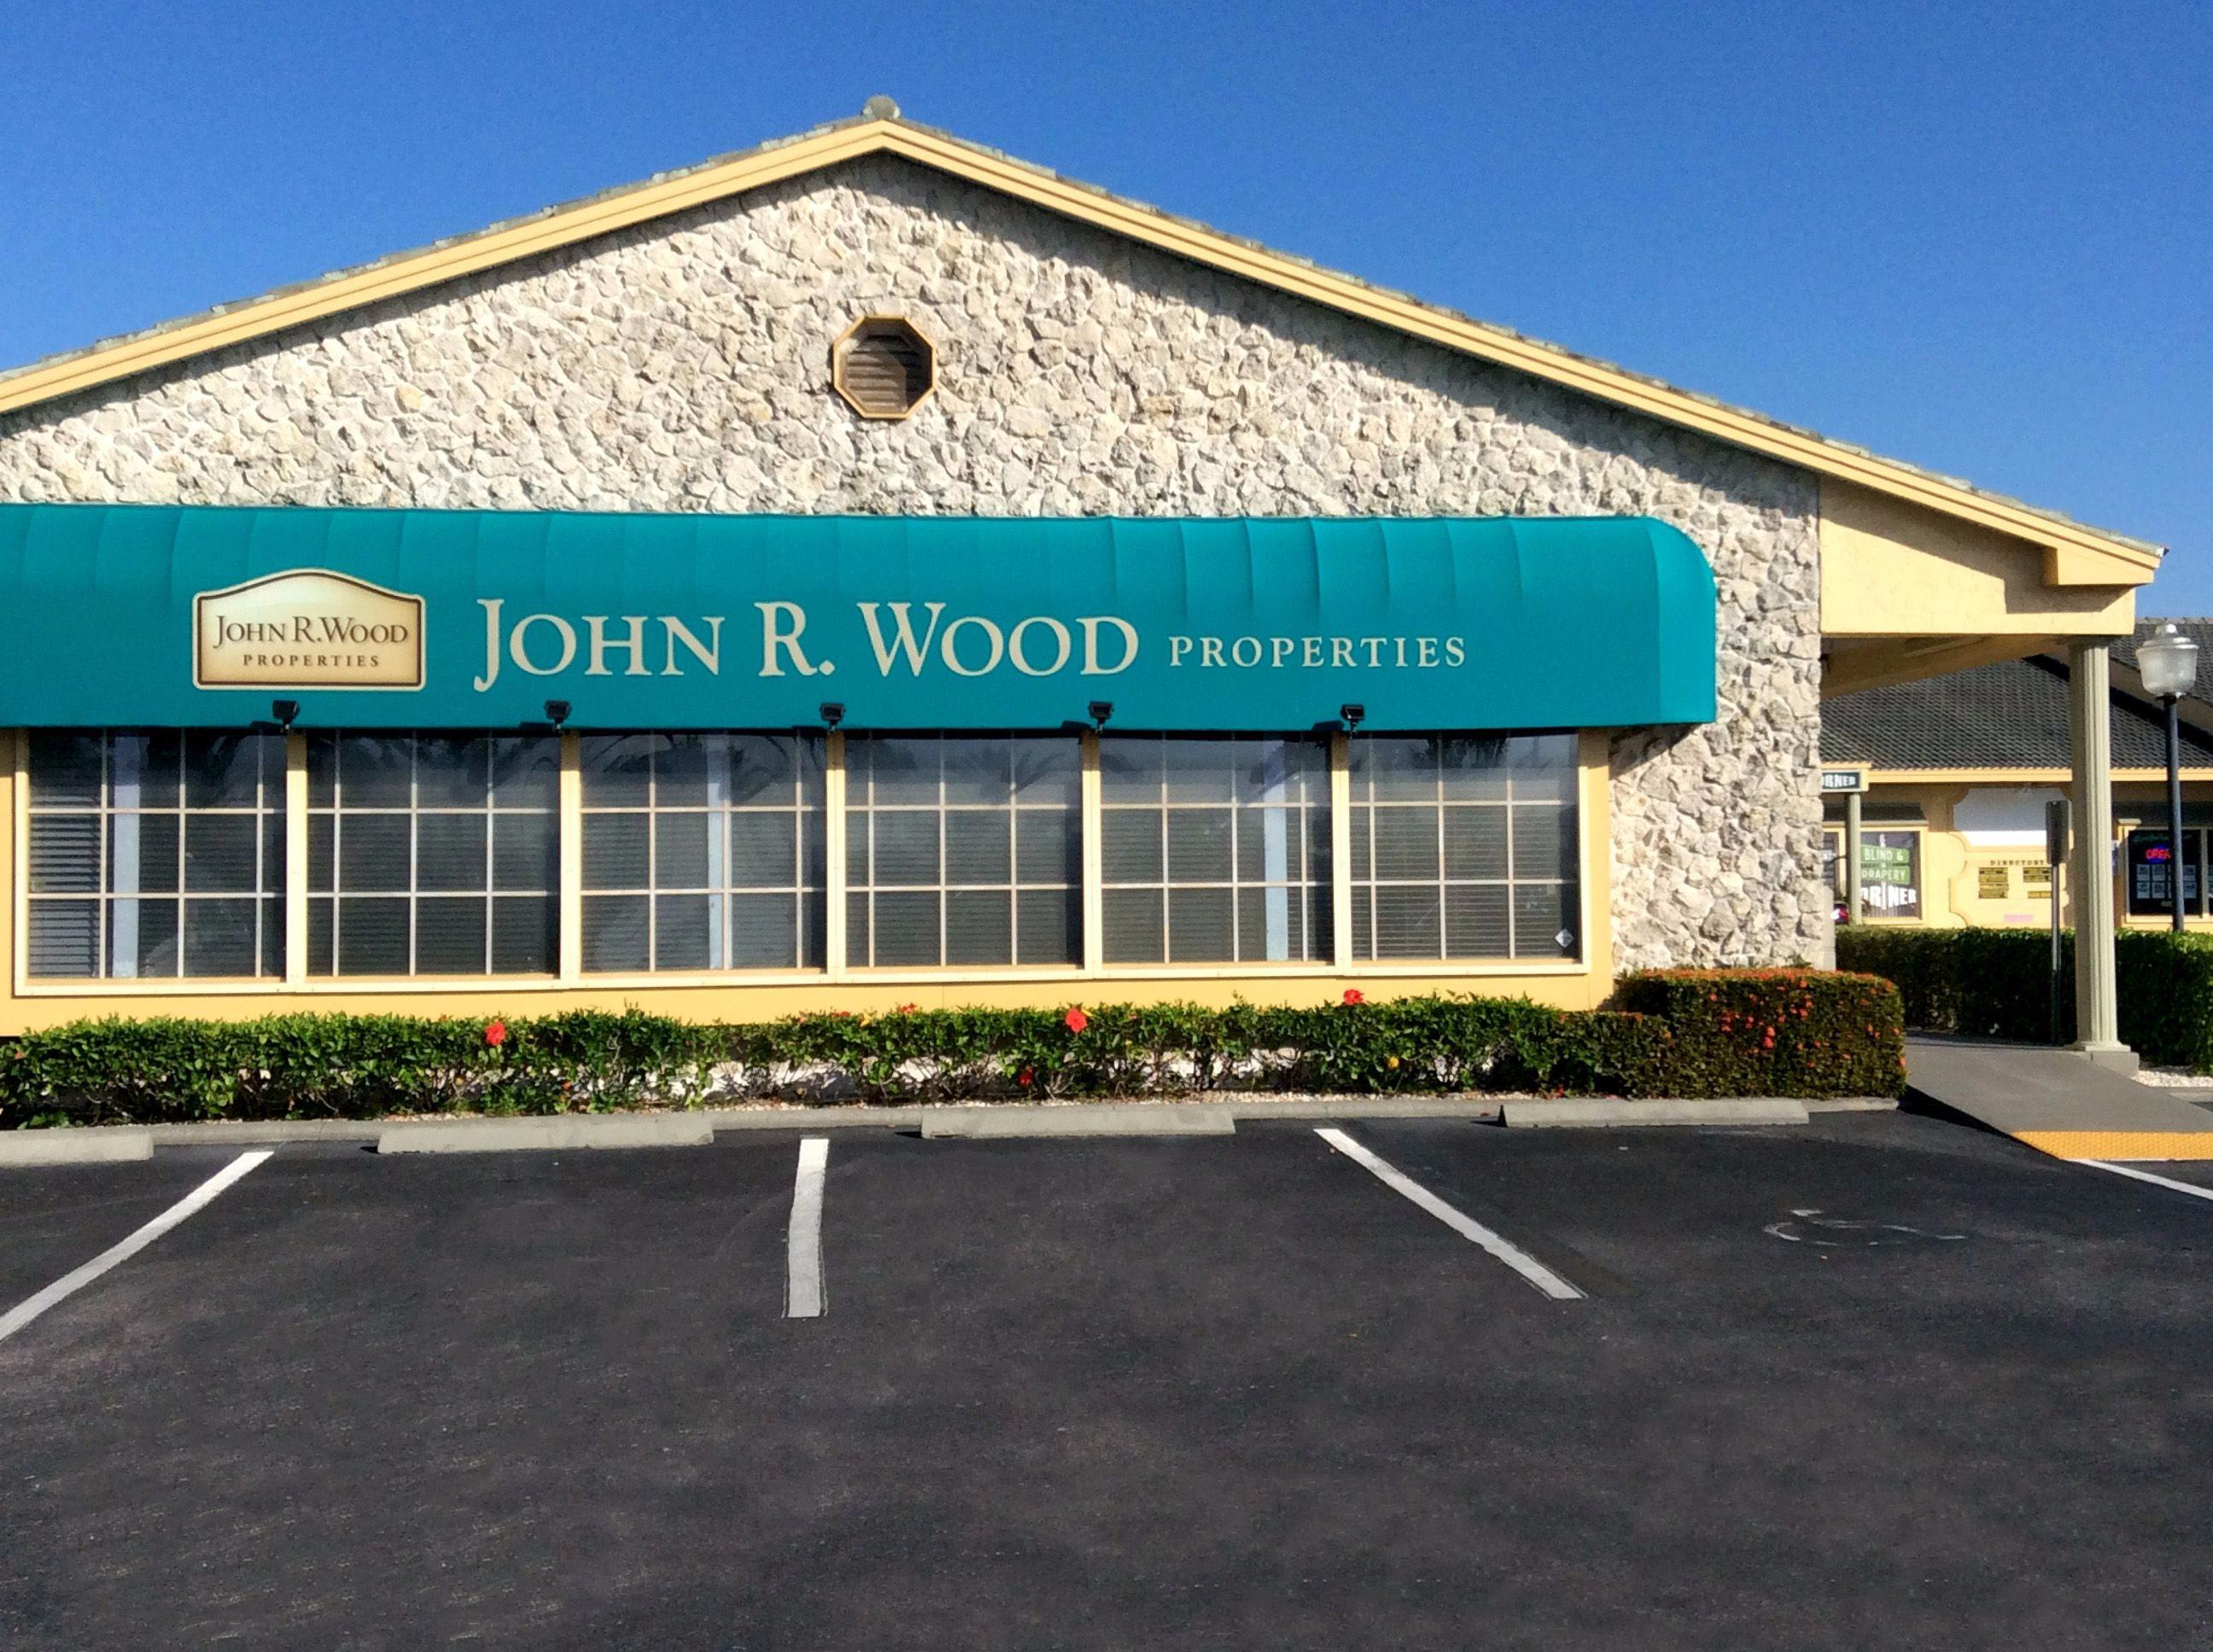 John R. Wood Properties Marco Island image 0